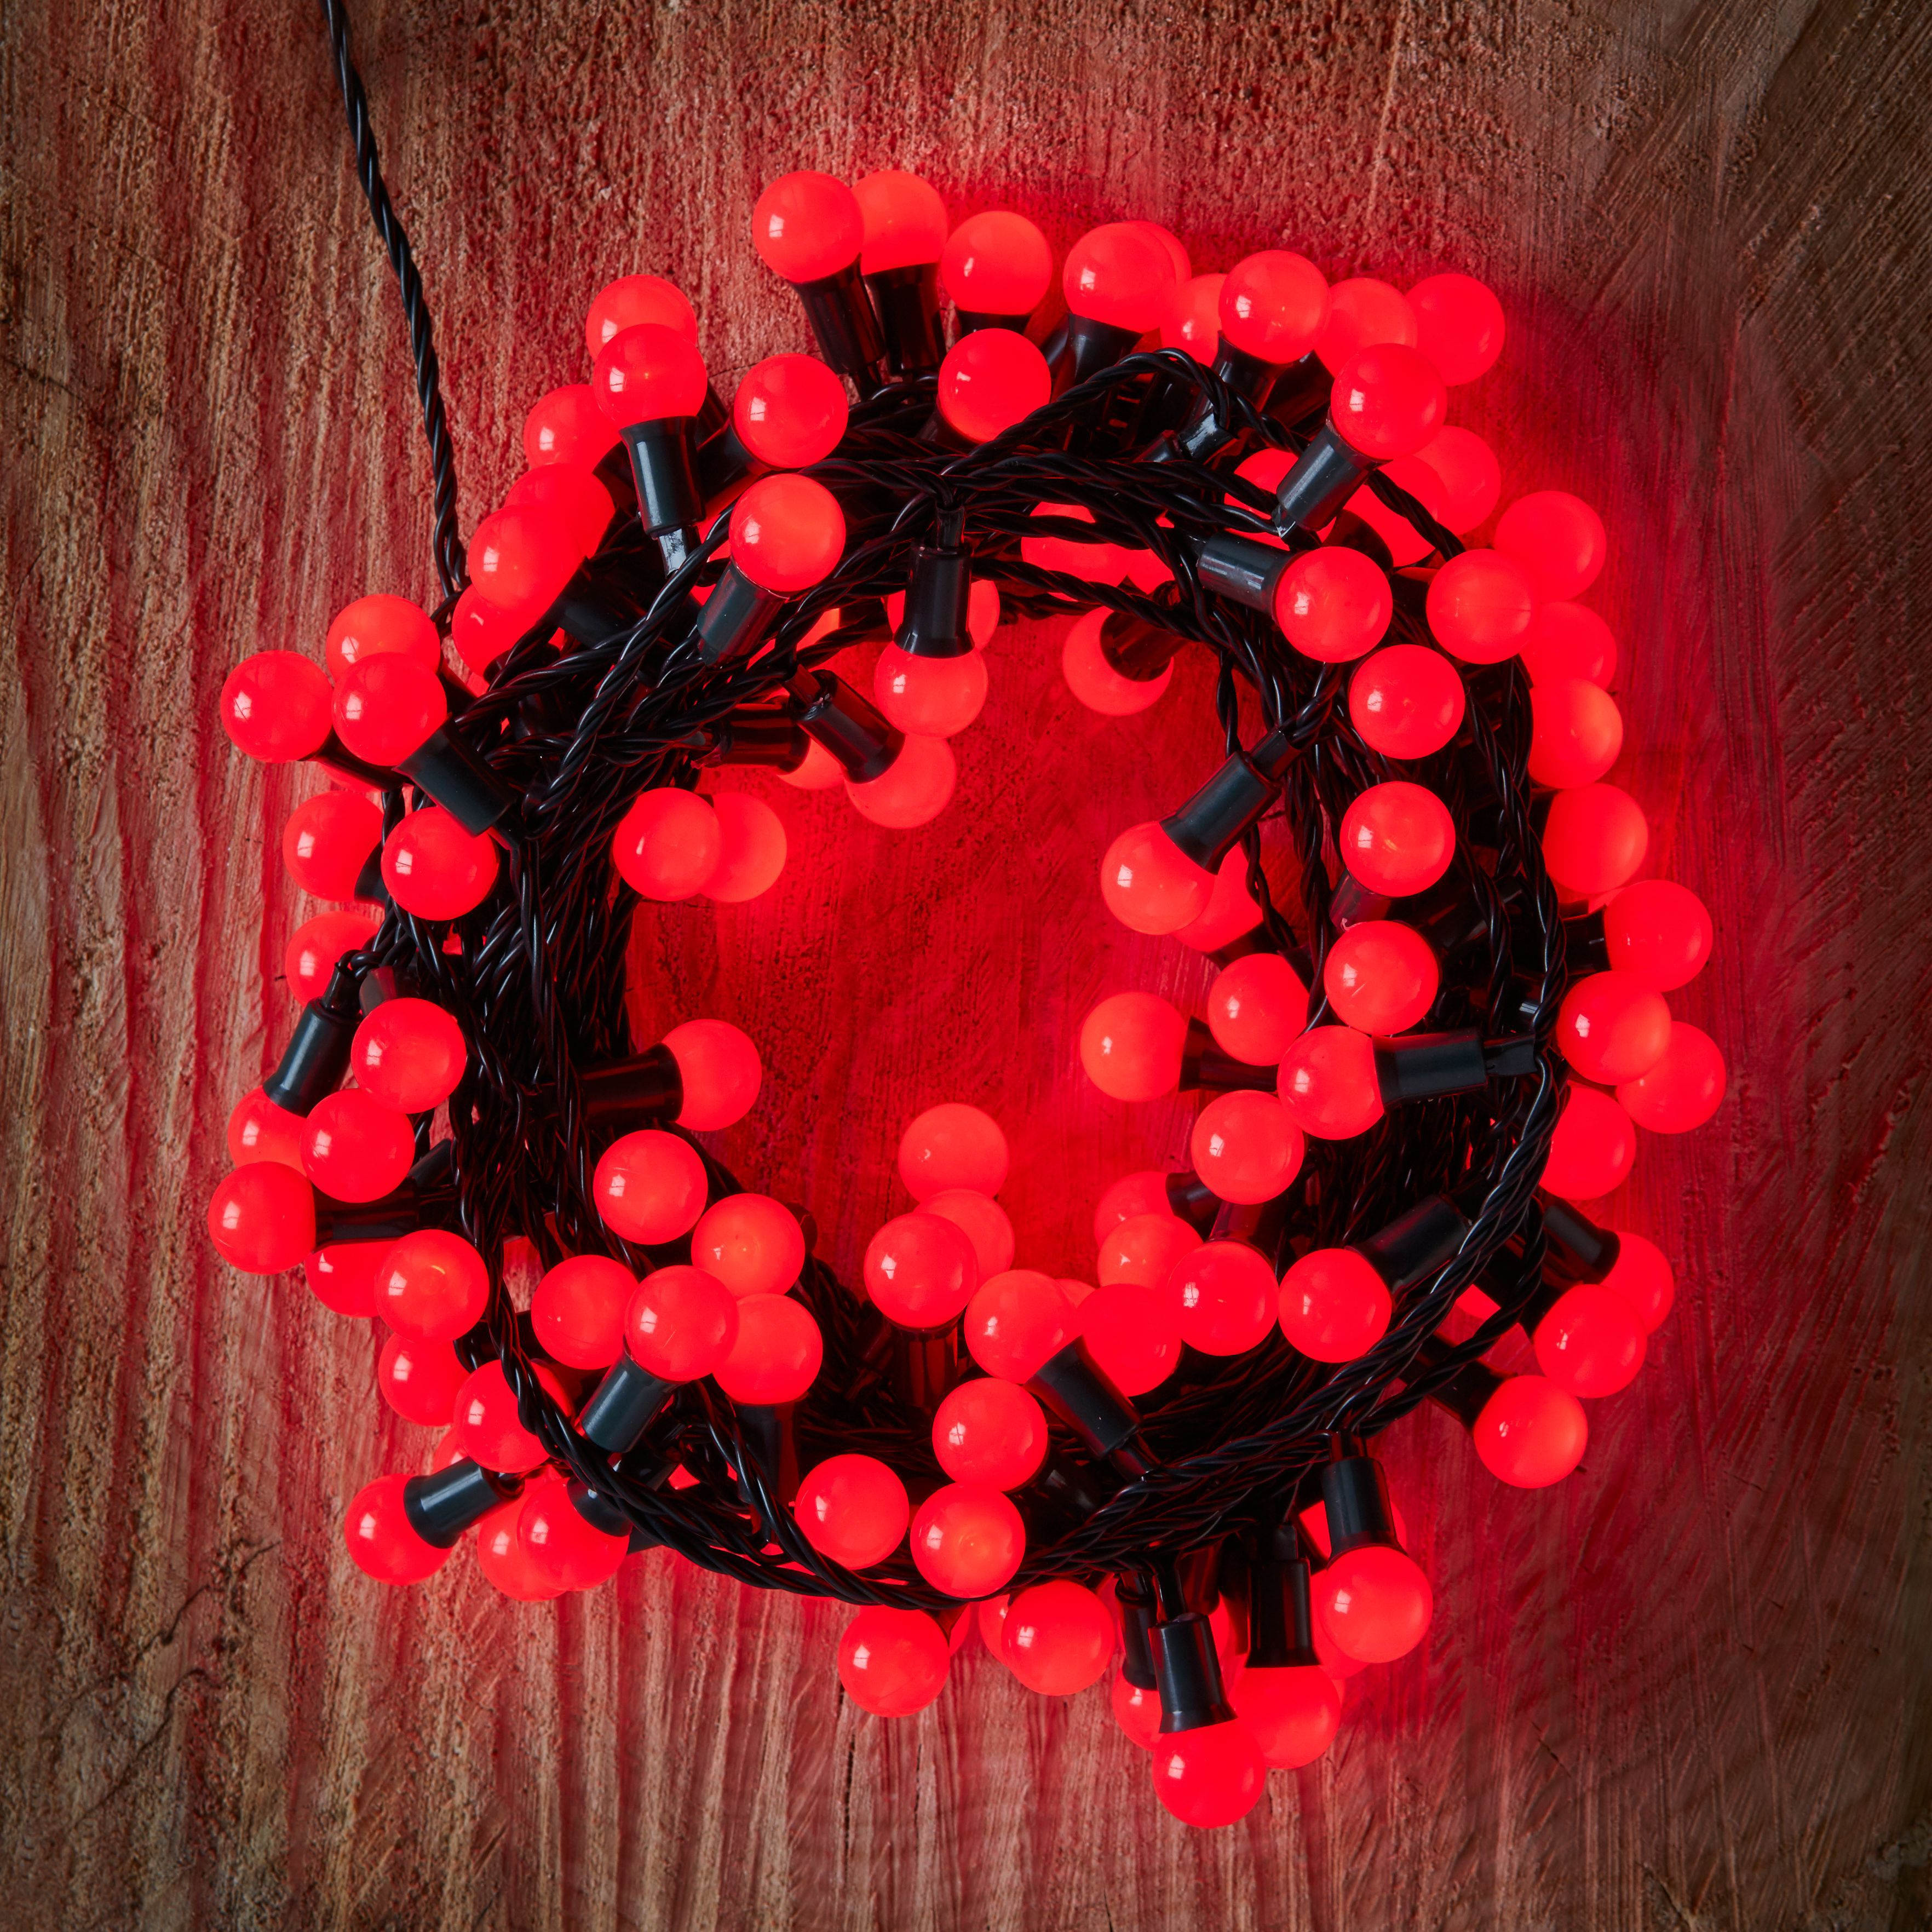 240 Red LED Berry Bulb String Lights Departments DIY at B&Q